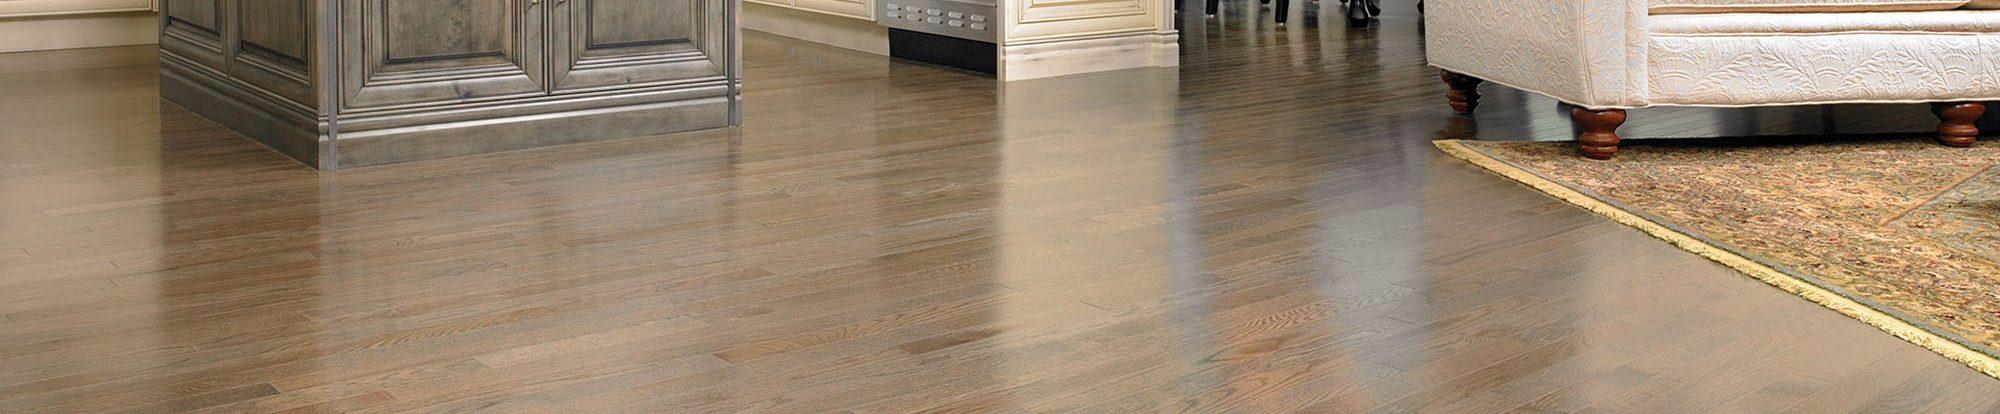 Derr Flooring Company  Supplying the Highest Quality